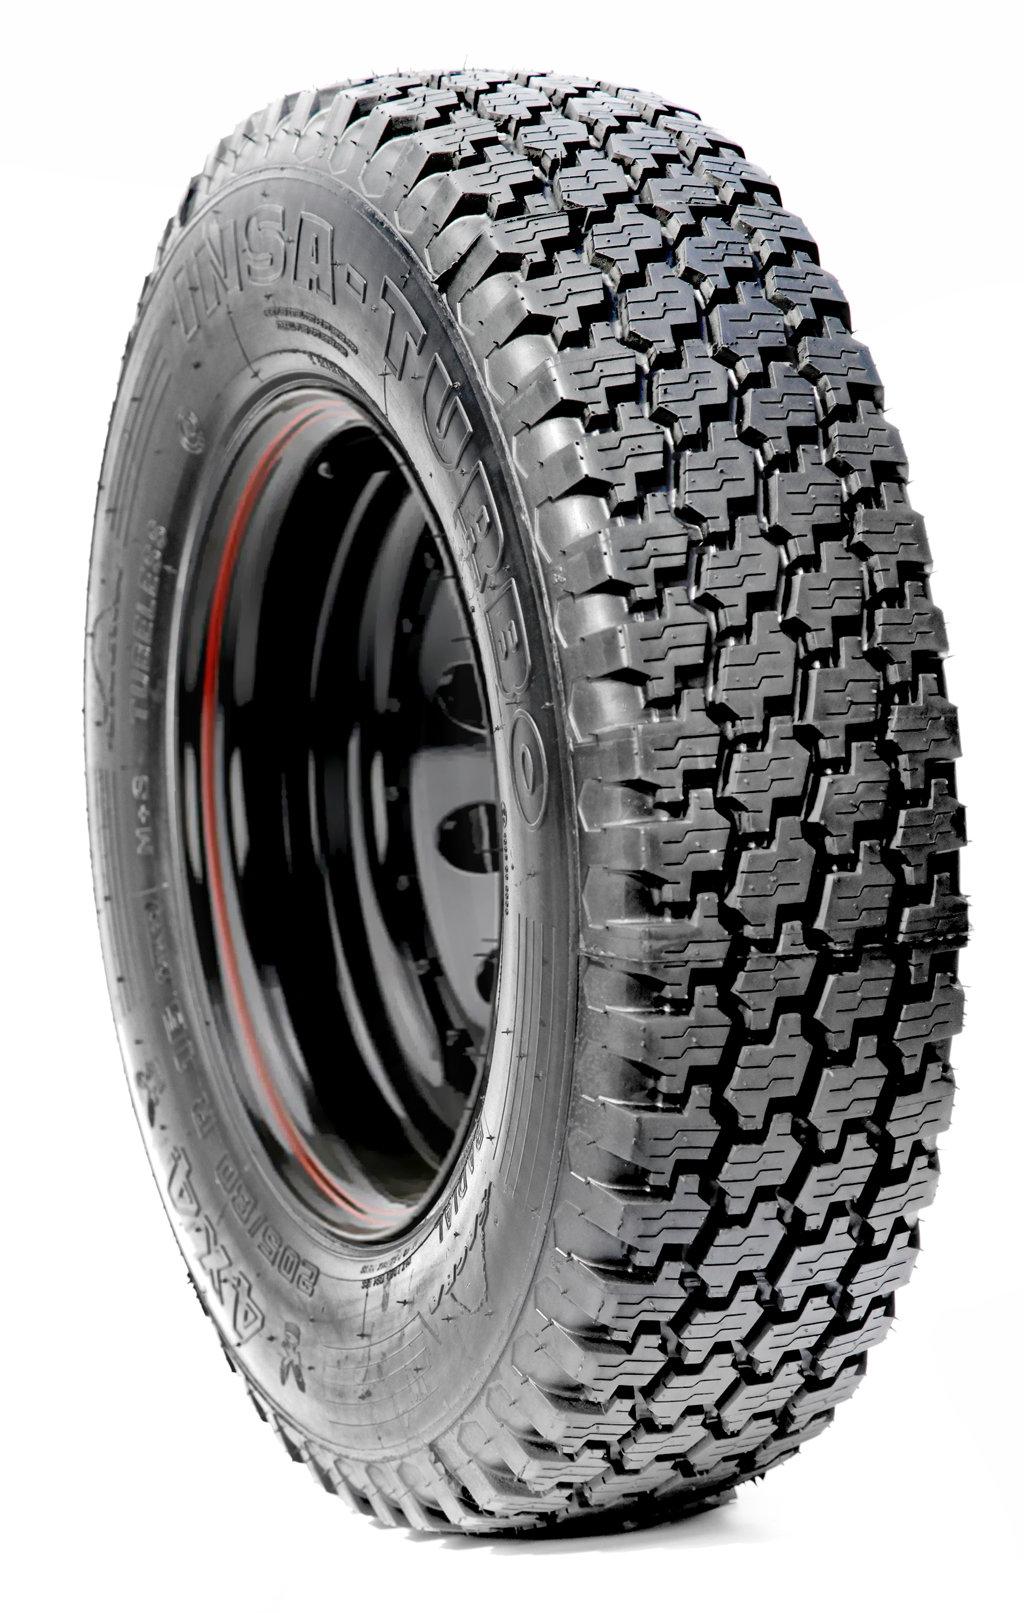 insa-turbo-sagra-235-75r15